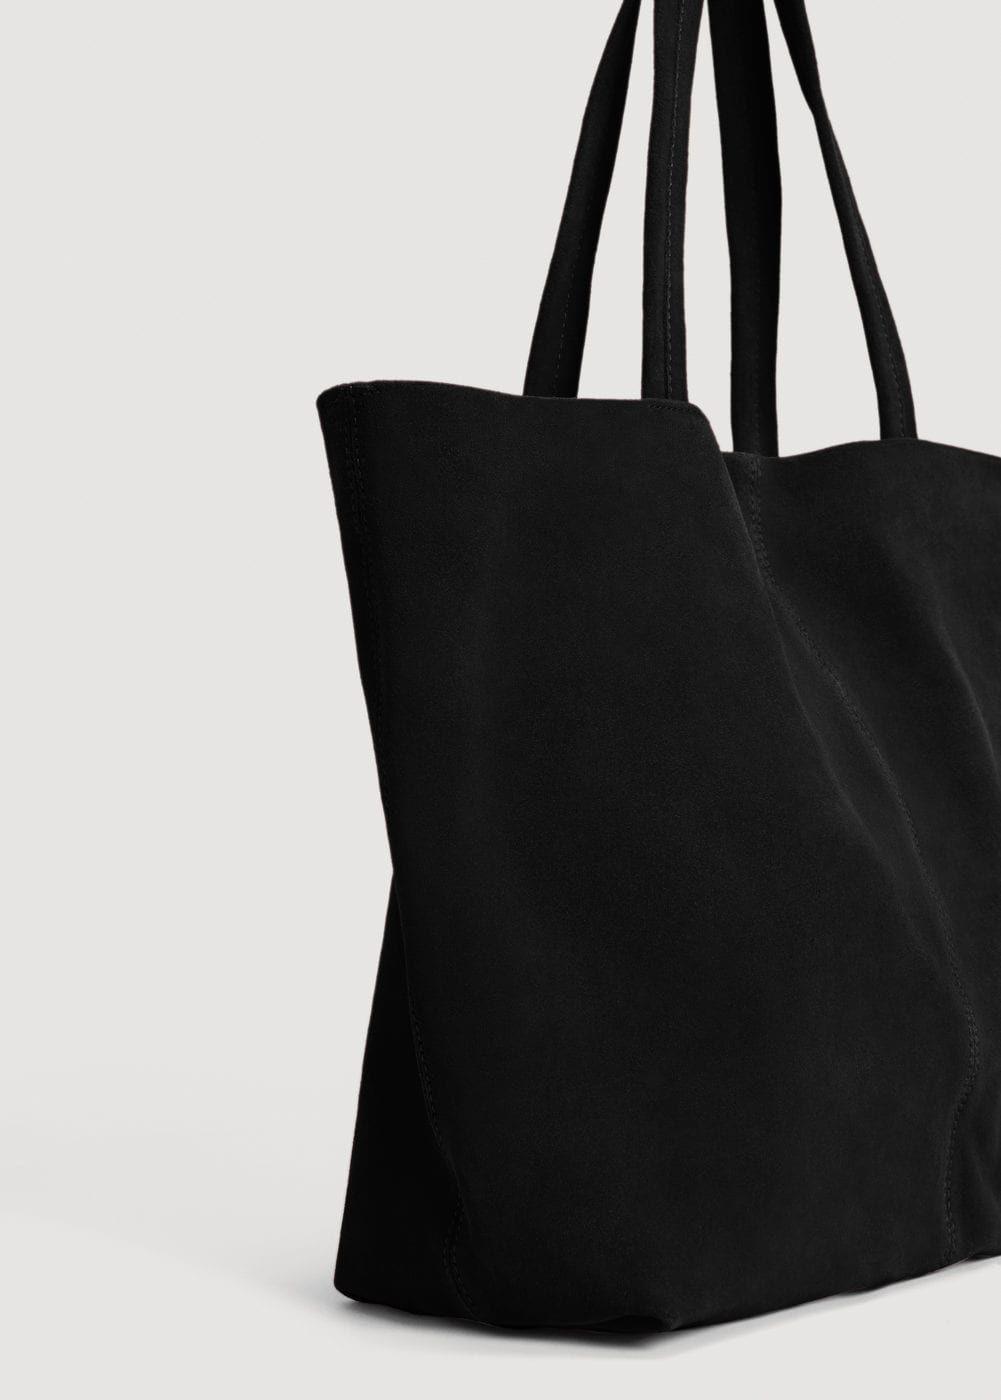 Bolsos MujerAccessories Piel De Shopper Bolso shxtQdrC